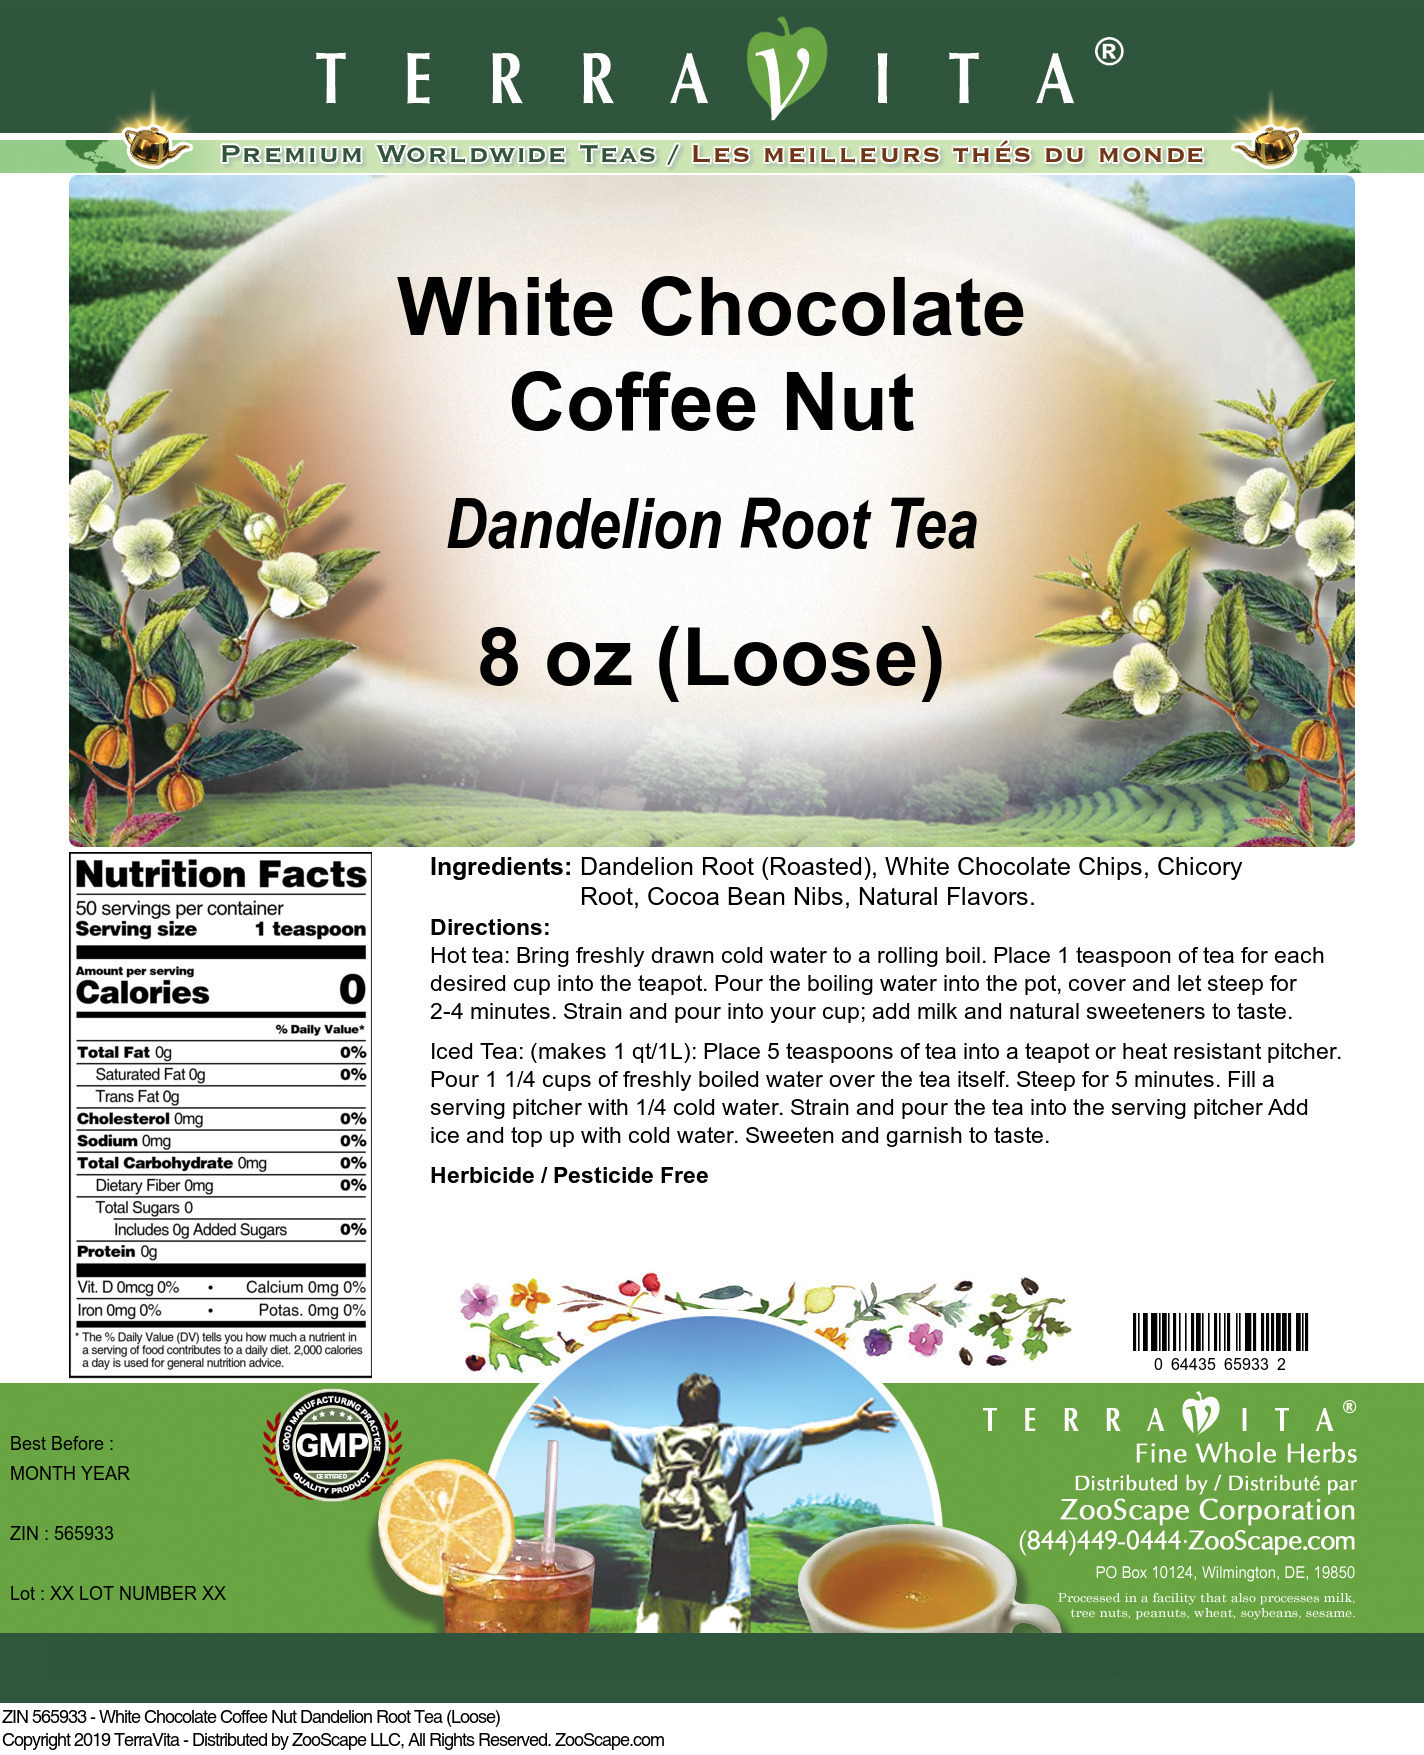 White Chocolate Coffee Nut Dandelion Root